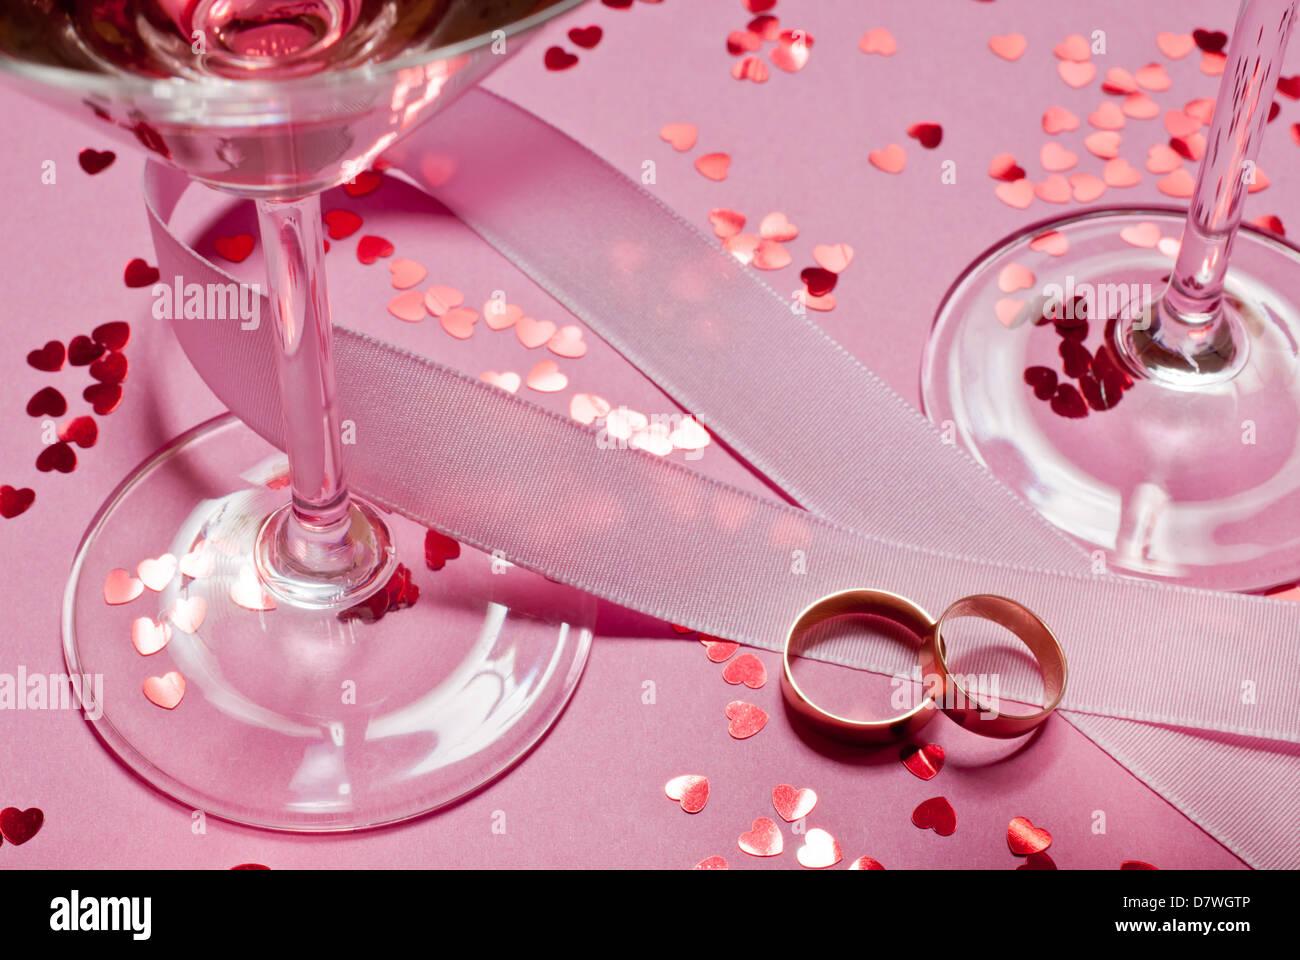 Wedding Favour Stock Photos & Wedding Favour Stock Images - Alamy